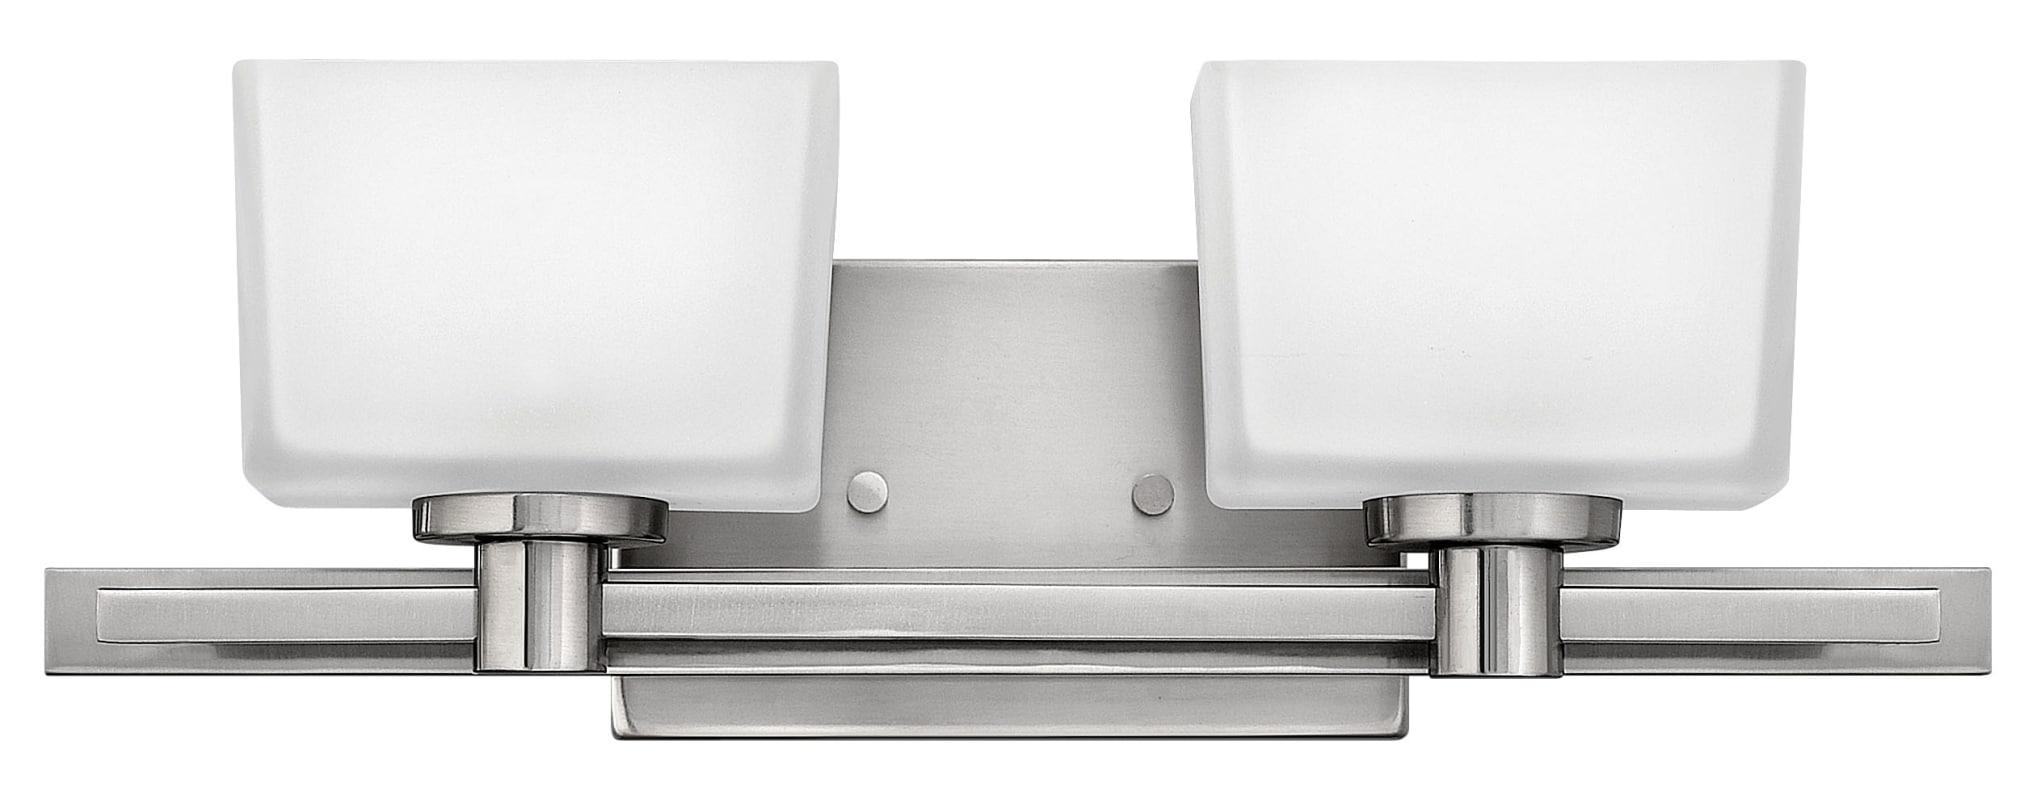 Hinkley 5022BN Brushed Nickel Contemporary Taylor Bathroom Light